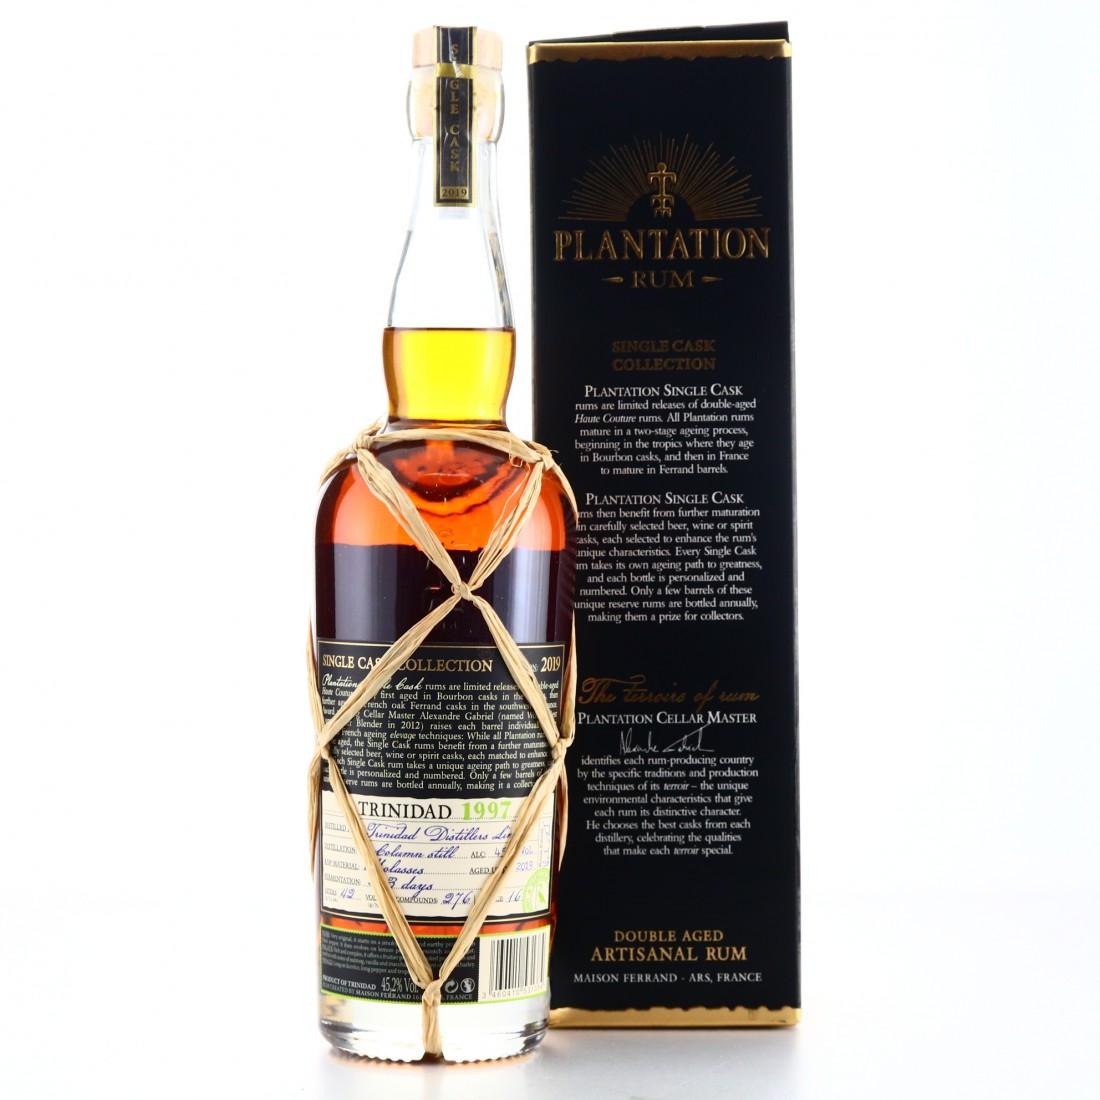 Trinidad Distillers 1997 Plantation / Kilchoman Finish